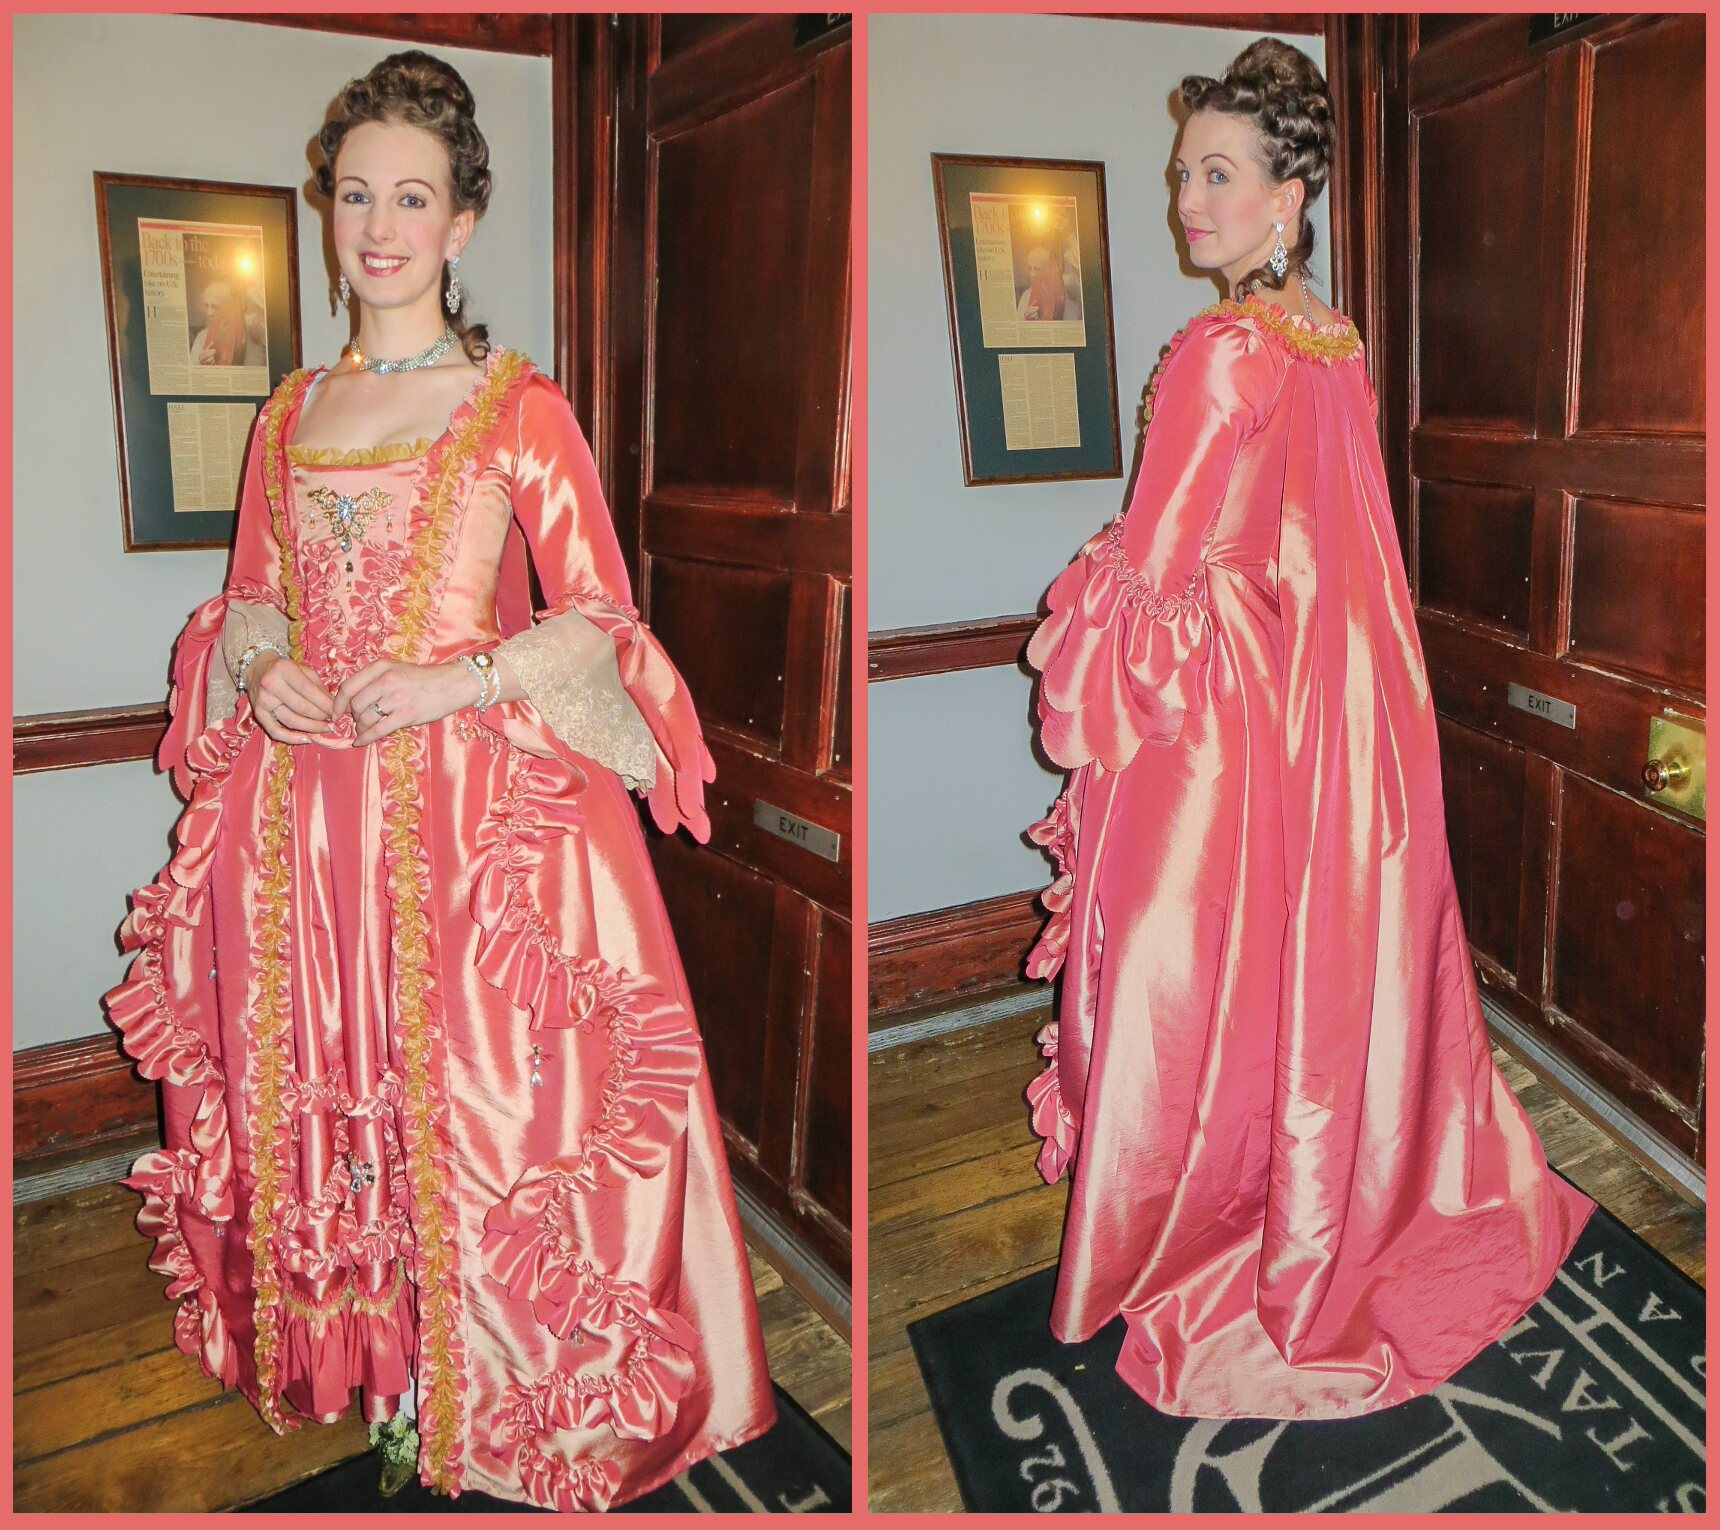 Robe A La Francaise: Robe A La Francaise From Original: Historical